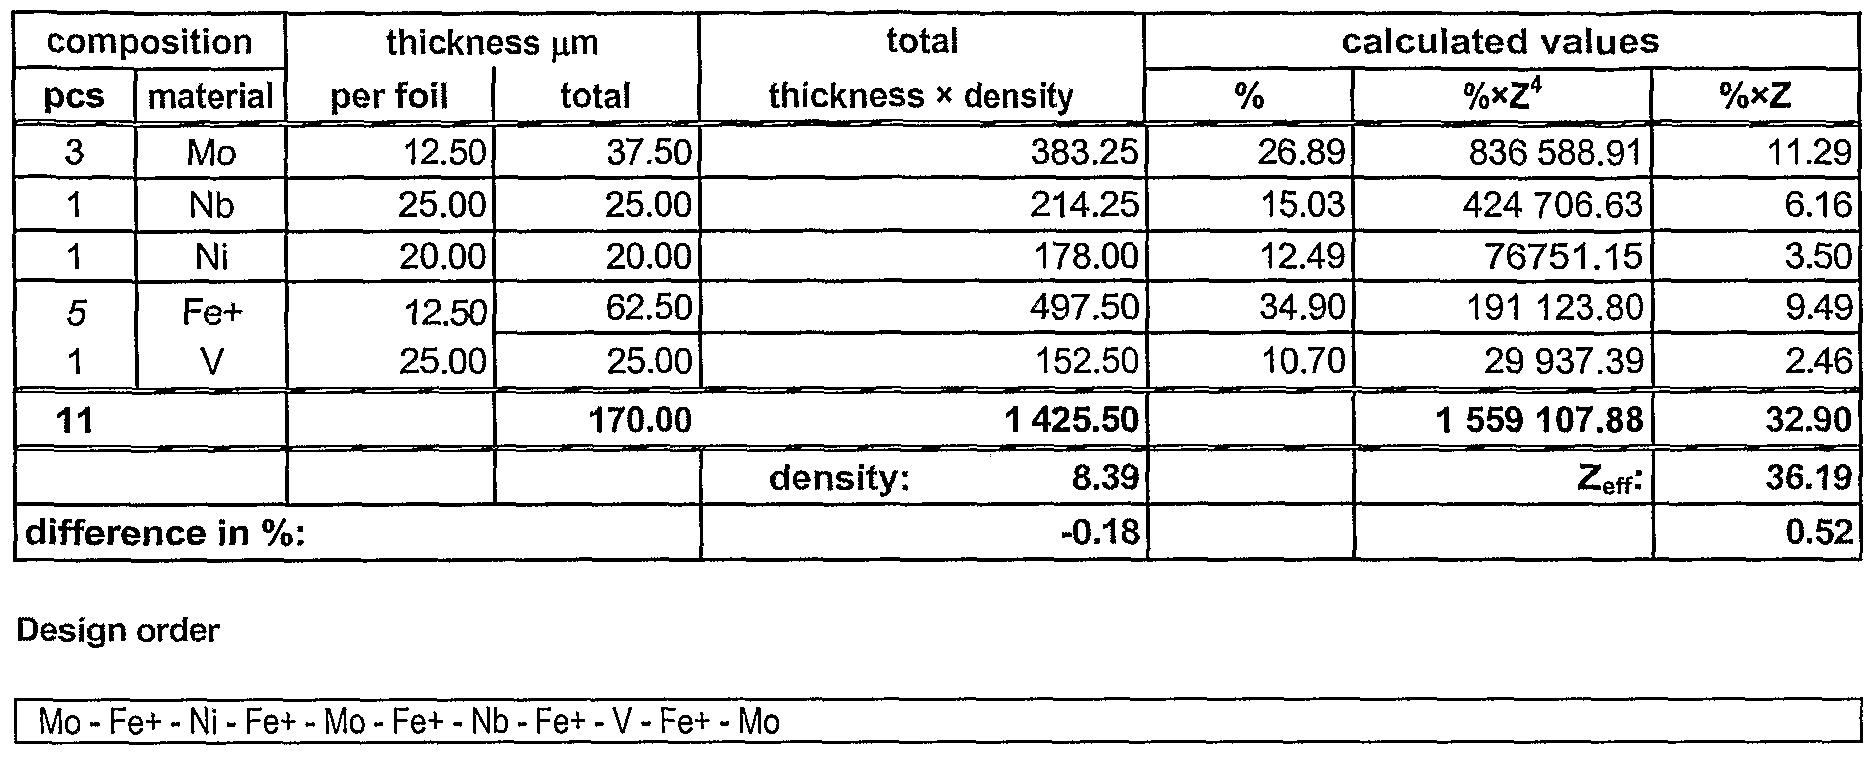 123/80 pb